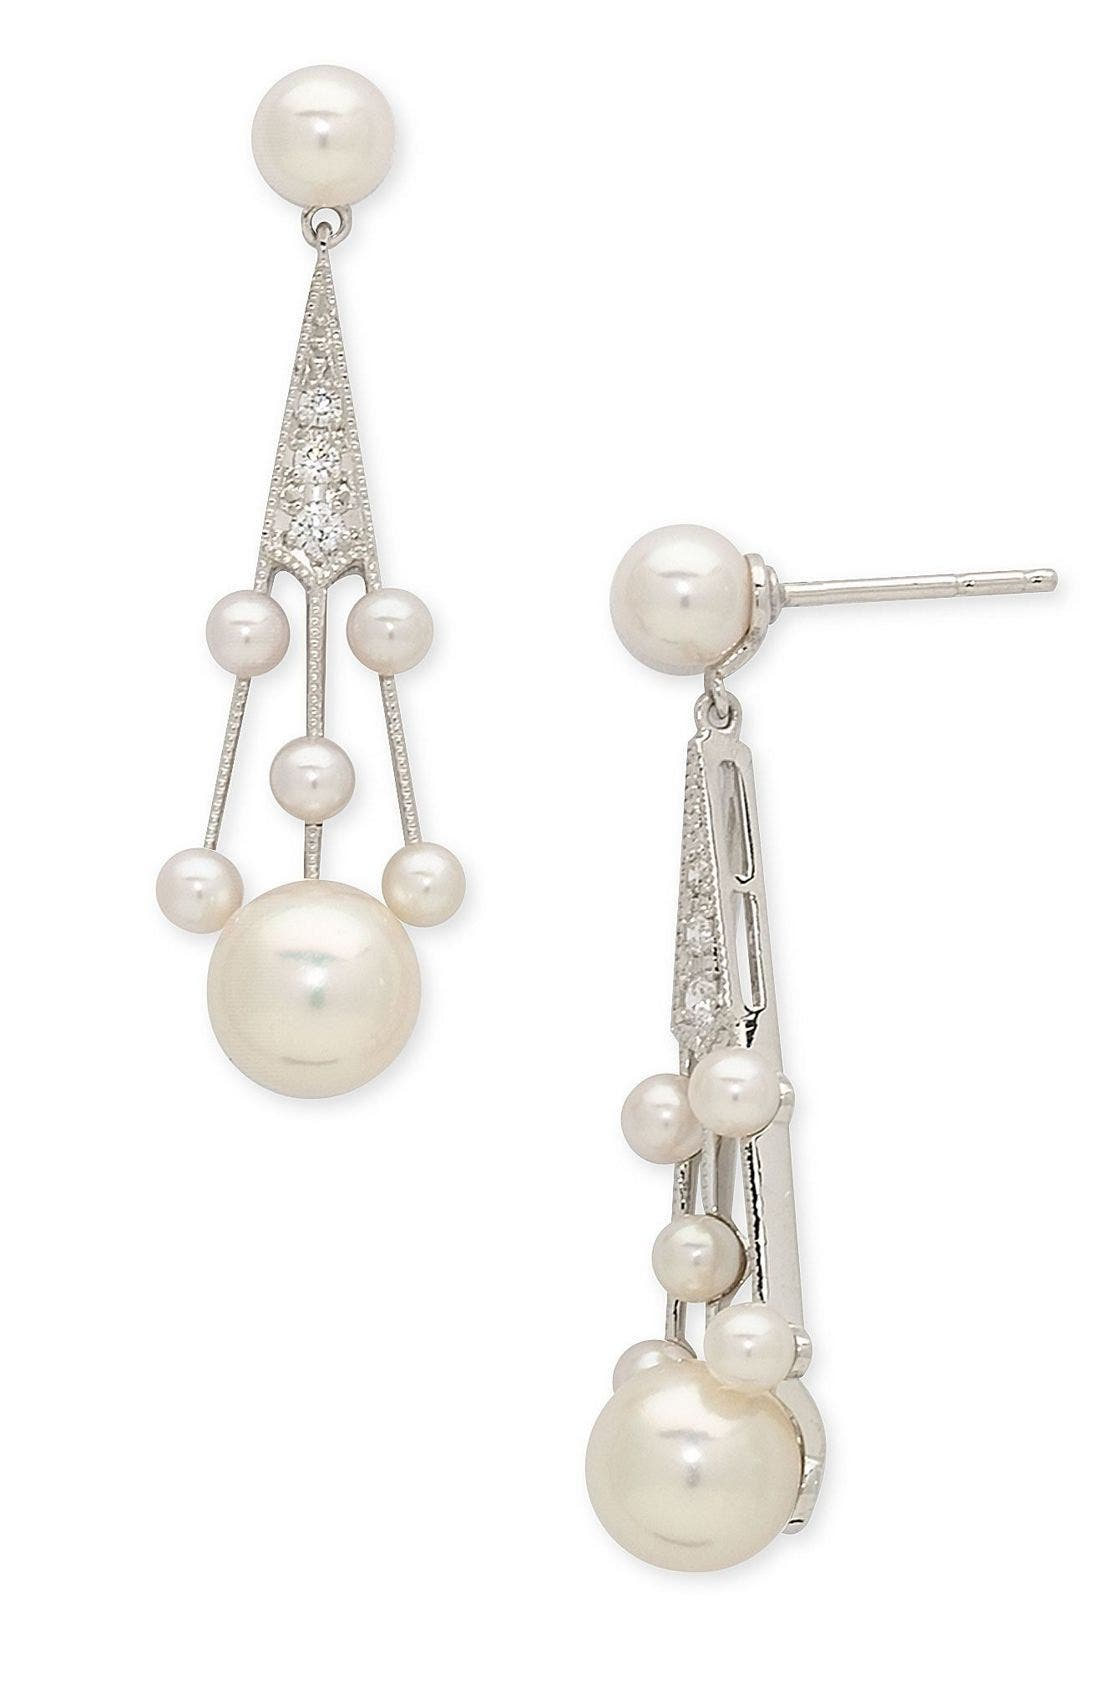 MIKIMOTO 'LEGACY COLLECTION' AKOYA CULTURED PEARL & DIAMOND EARRINGS